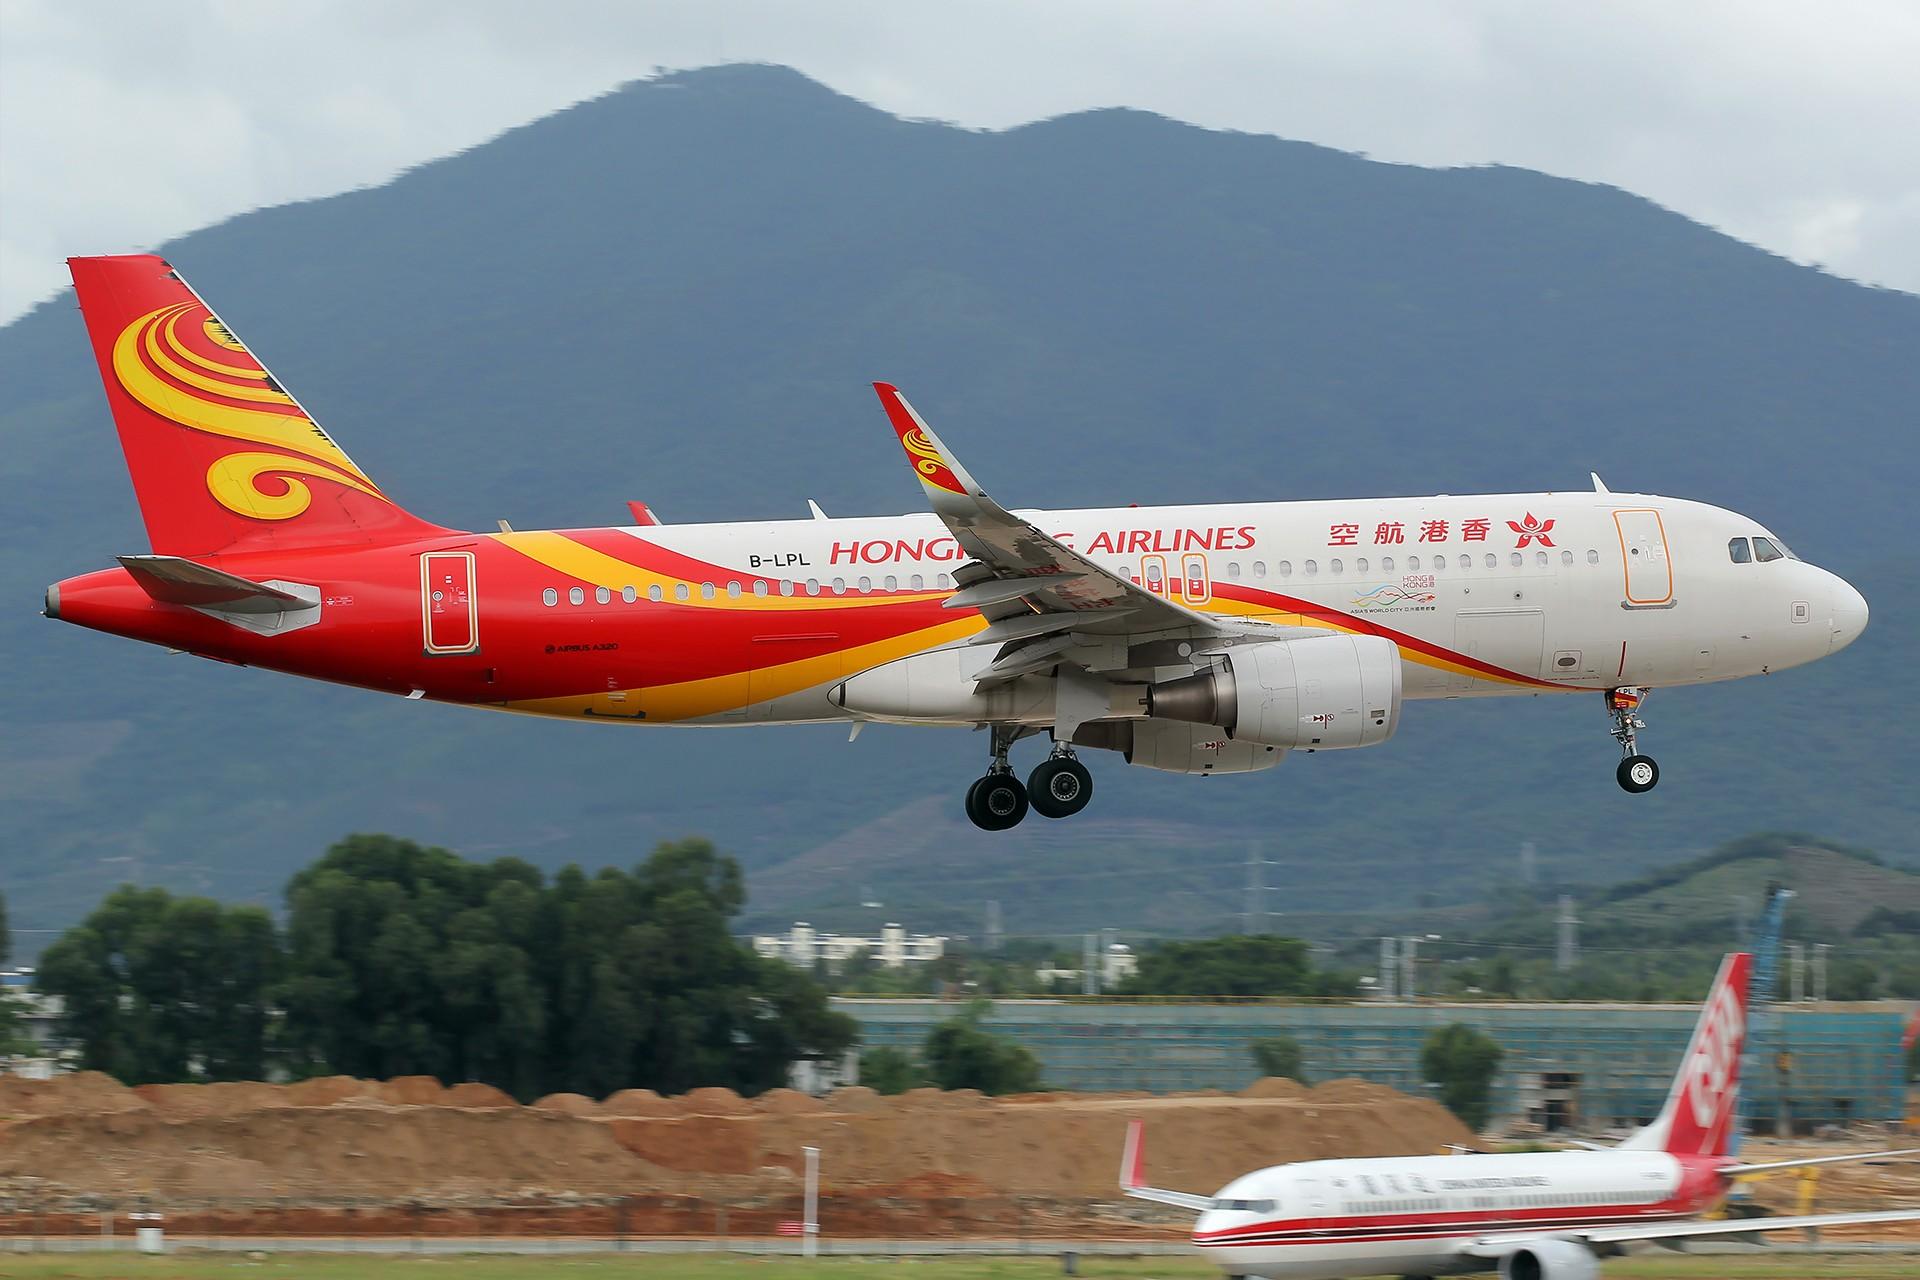 [SYX]香港AND吉祥 AIRBUS A320-200 B-LPL 中国三亚凤凰国际机场